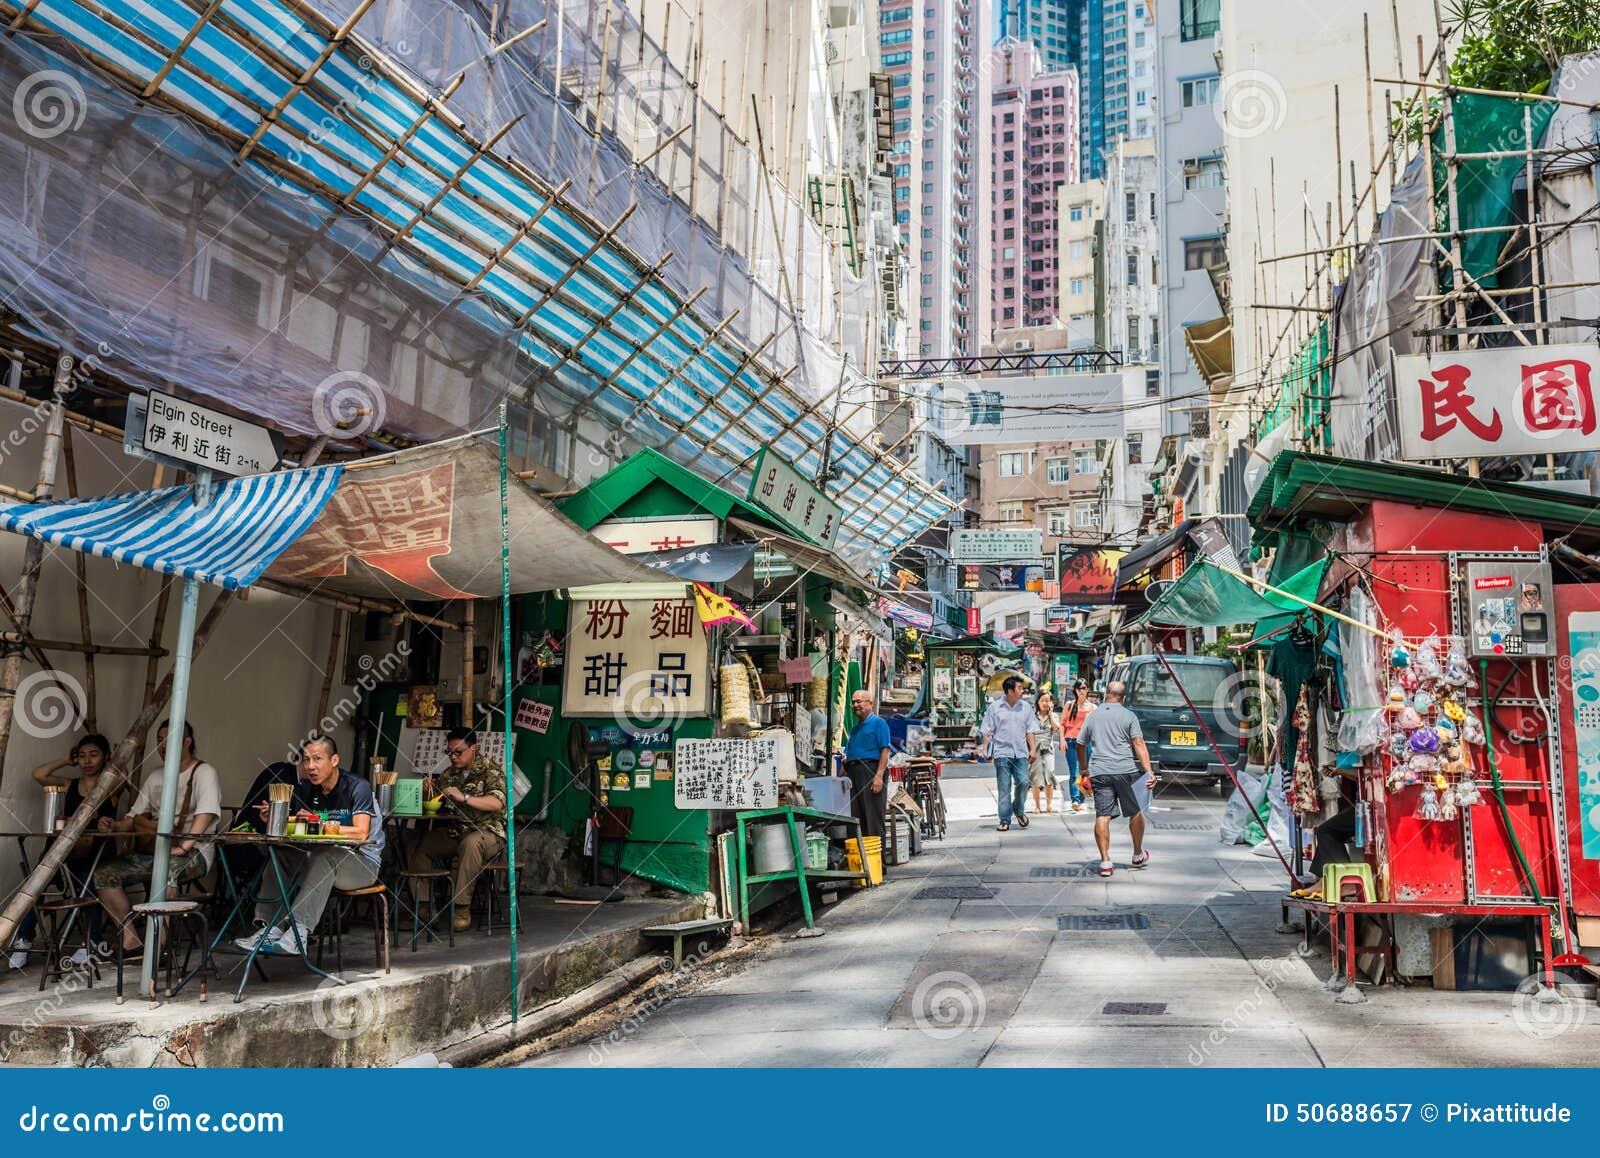 Elgin Street Restaurants